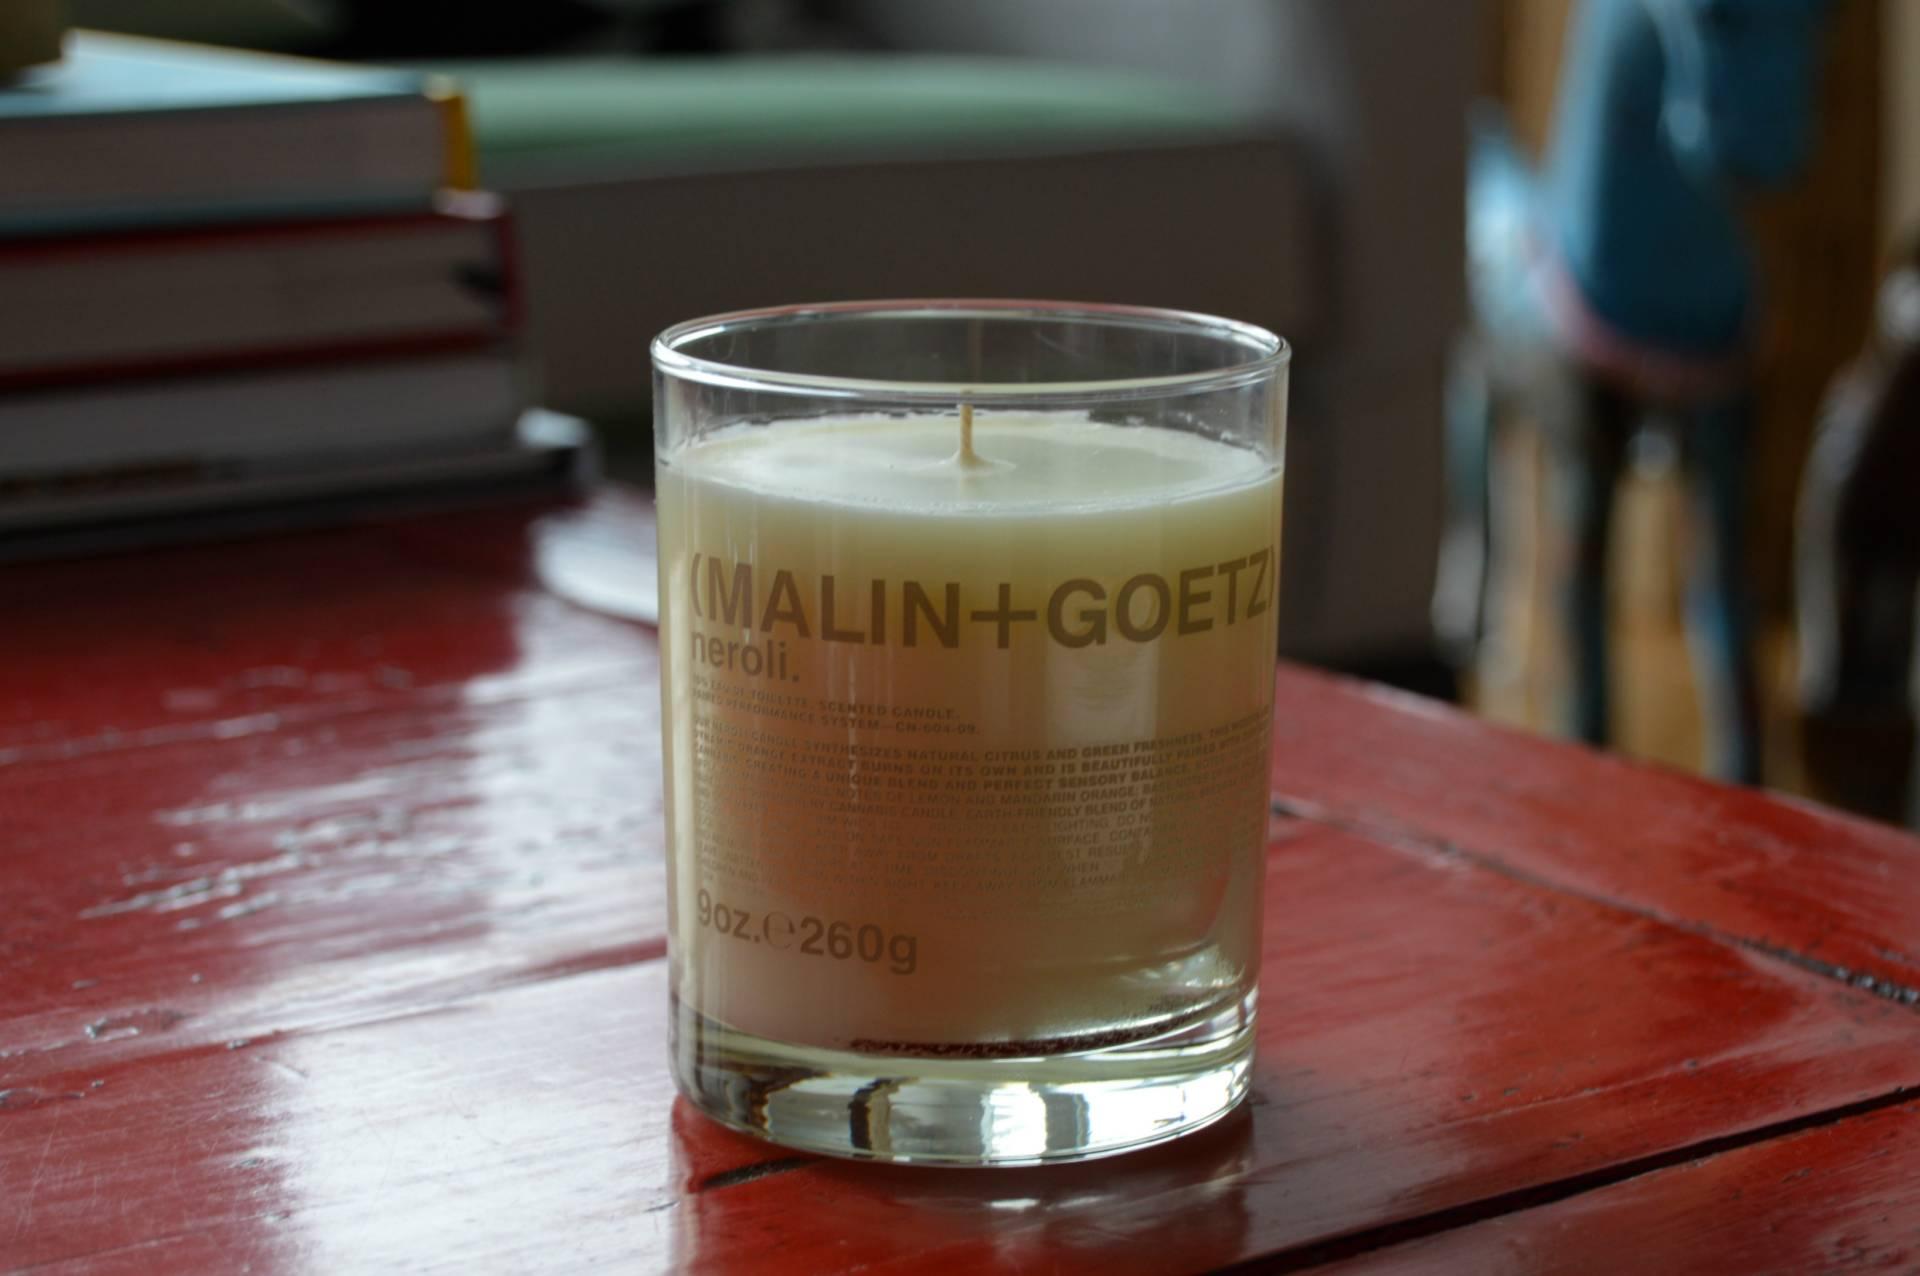 maline-goetz-neroli-candle-inhautepursuit-candles-review